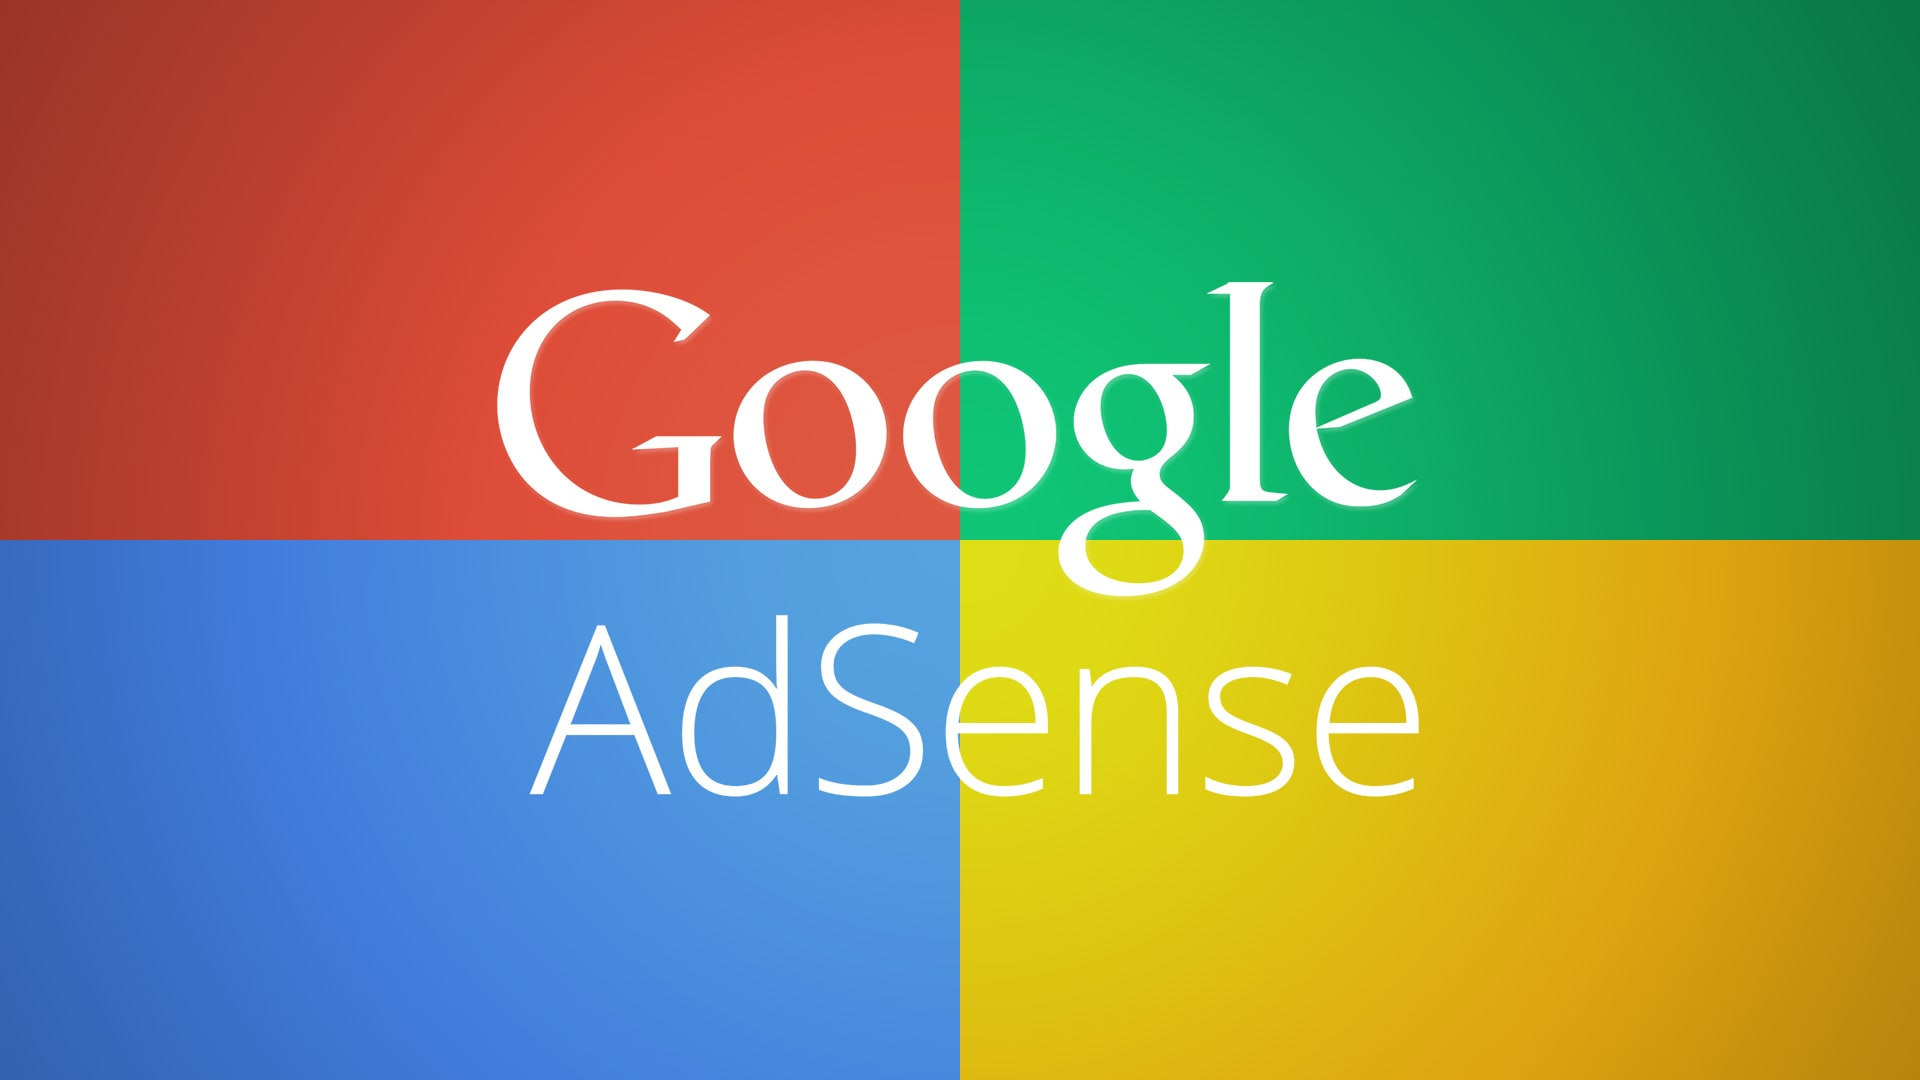 گوگل ادونز